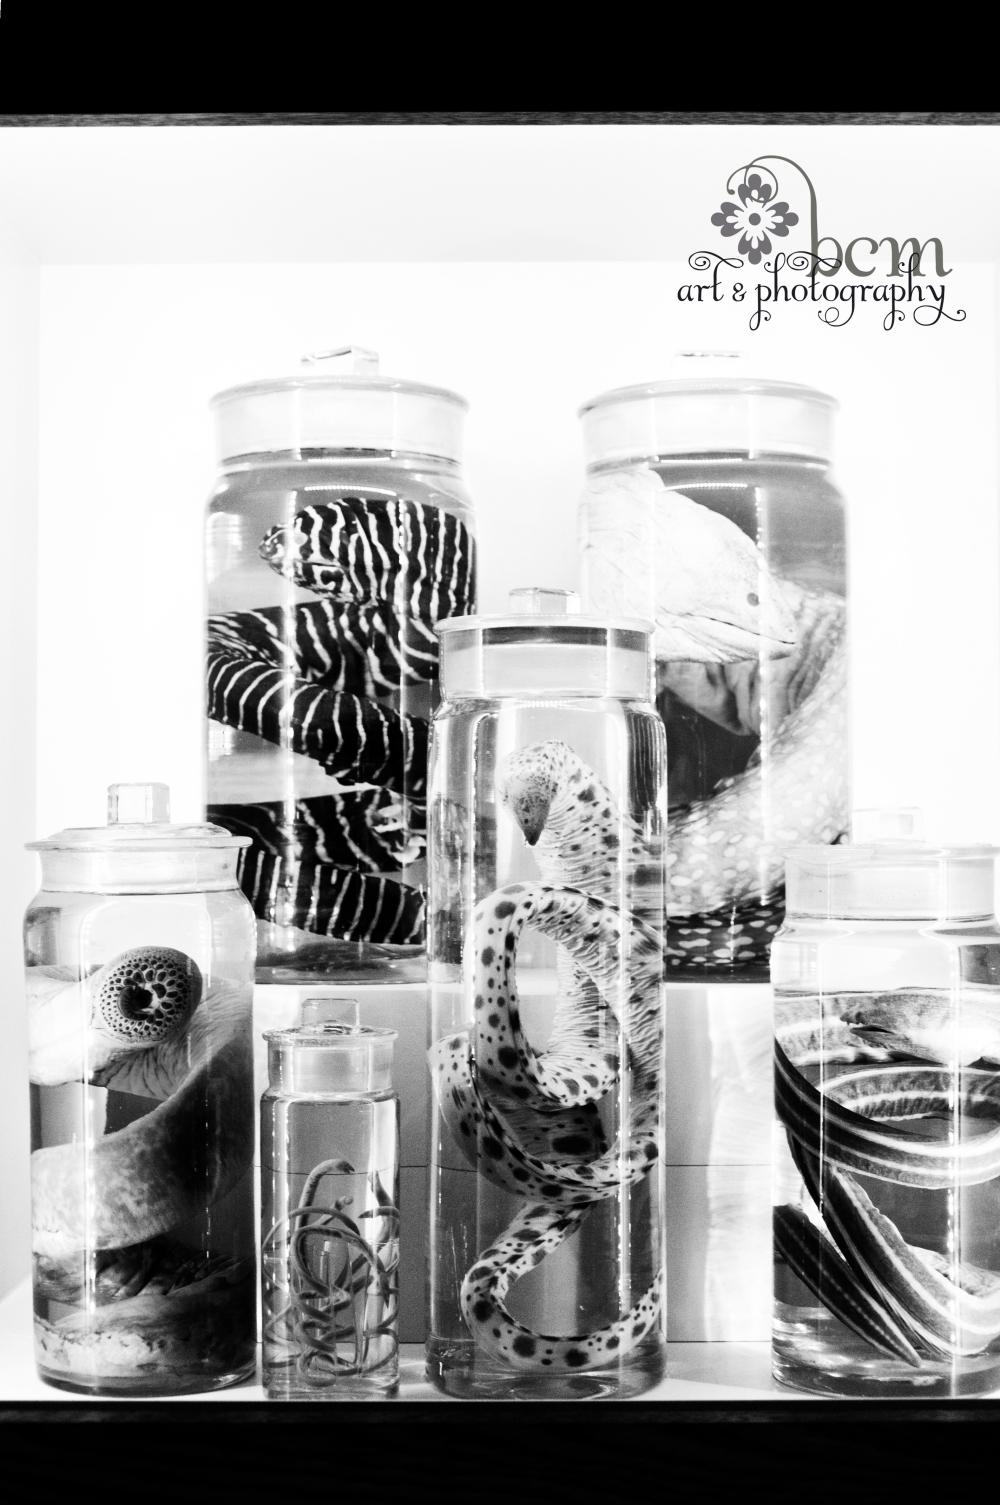 bcm art & photography 2013